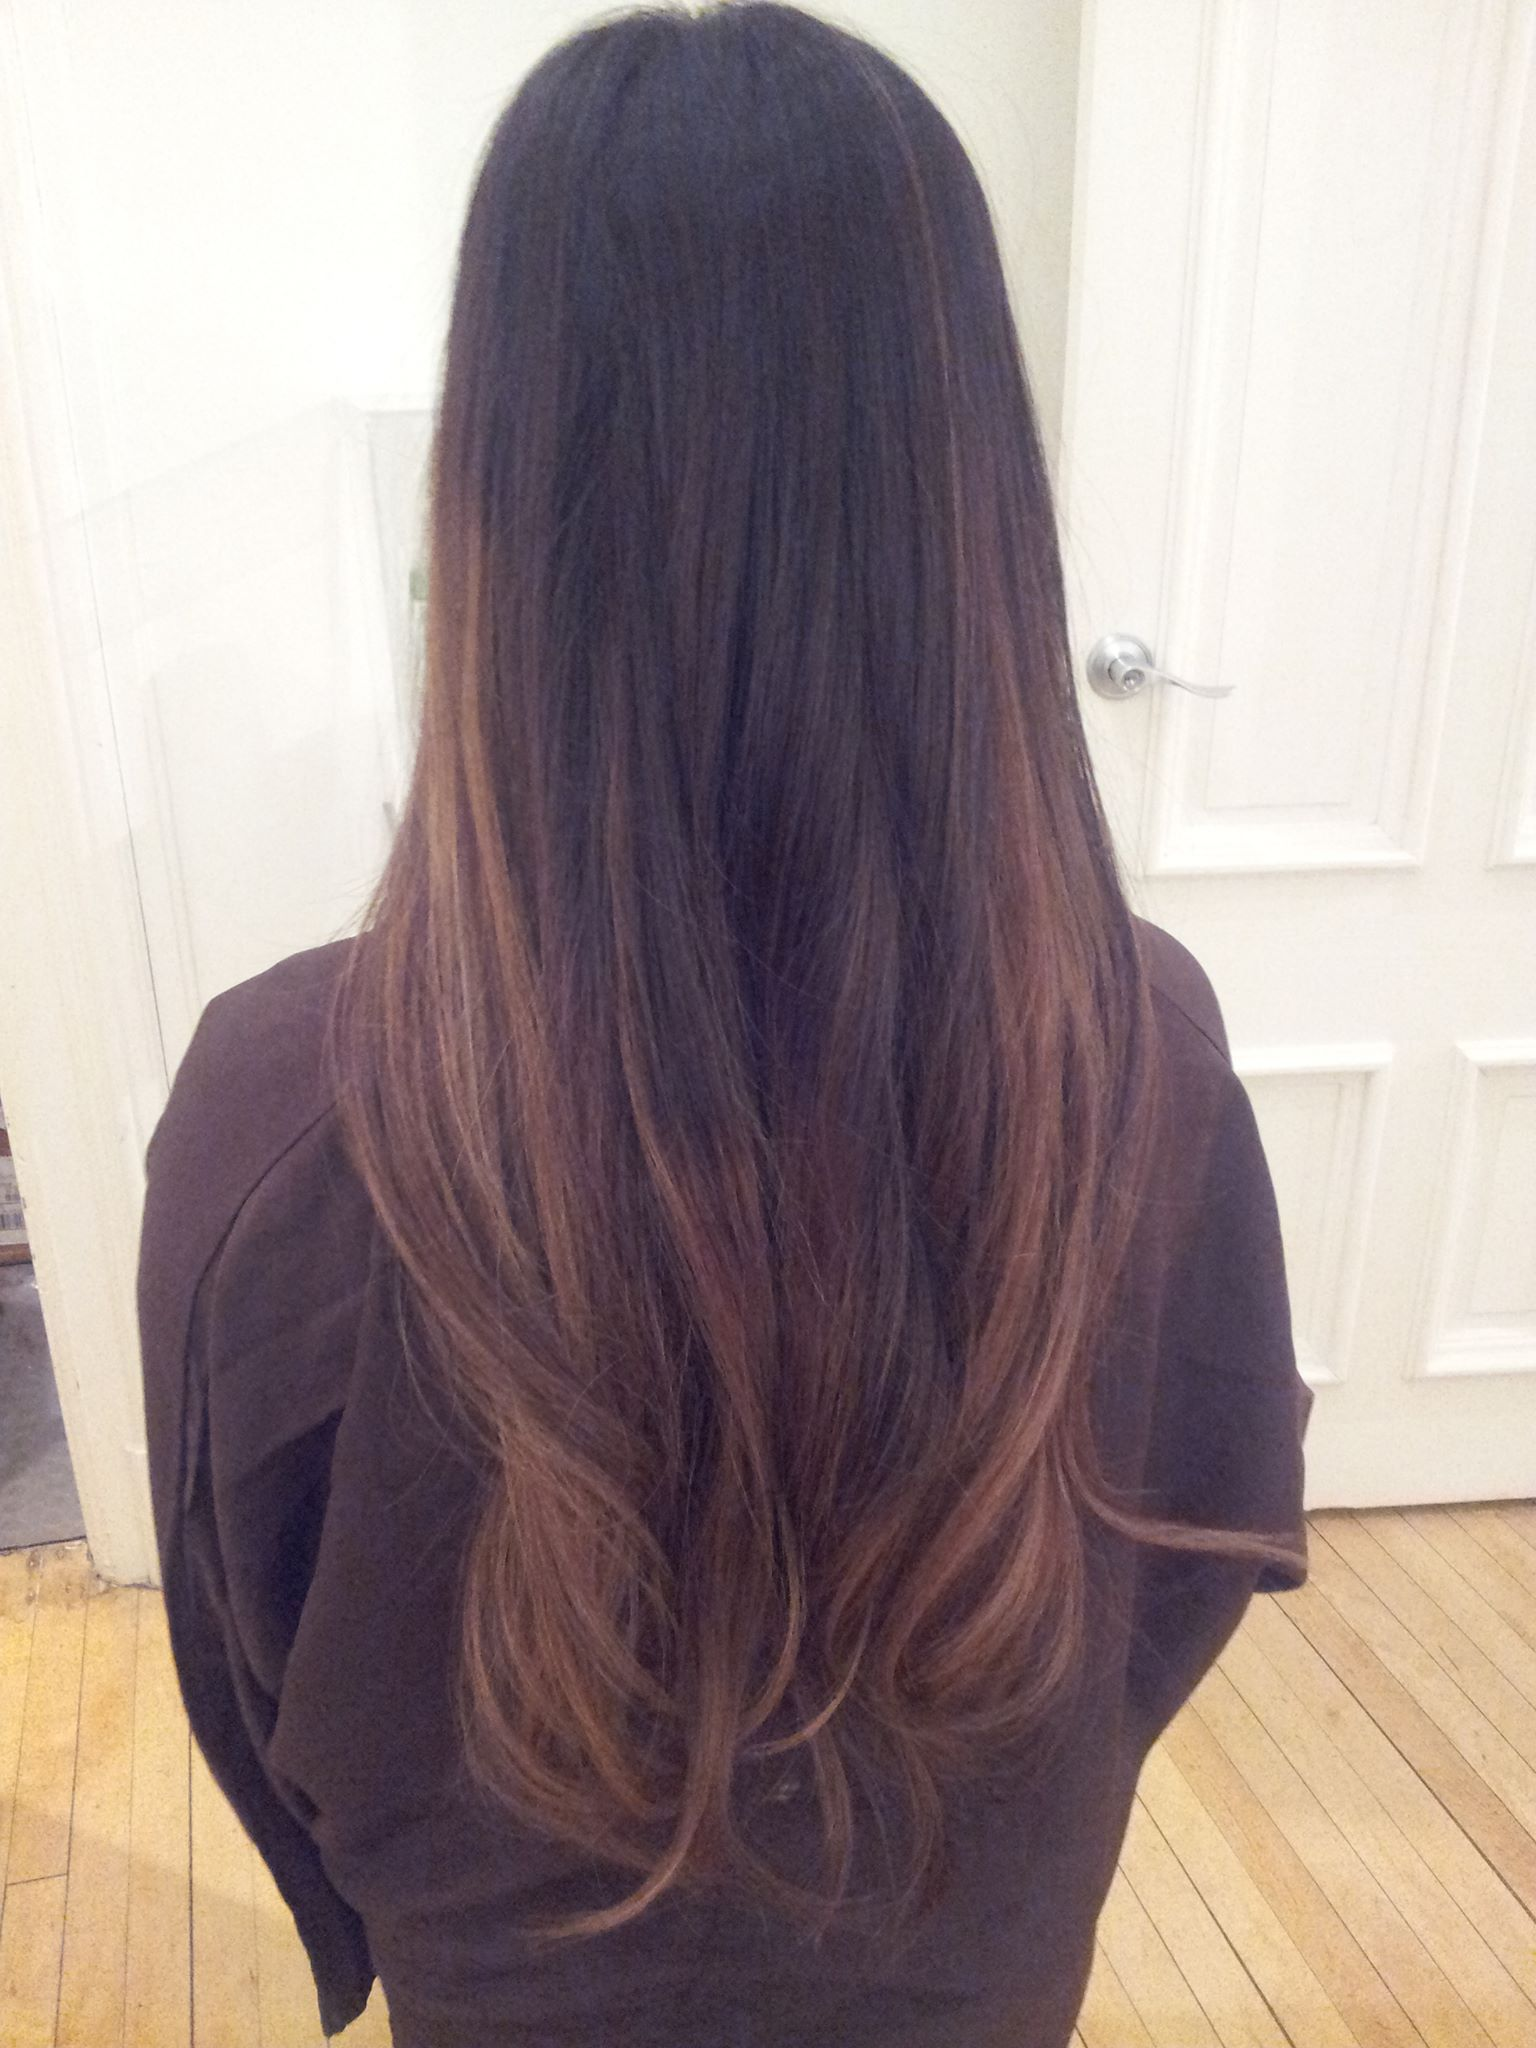 Ig Thelivingroomhairlounge Michigan Hairstylist Short Sassy Hair Short Hair Styles Pixie Hair Styles